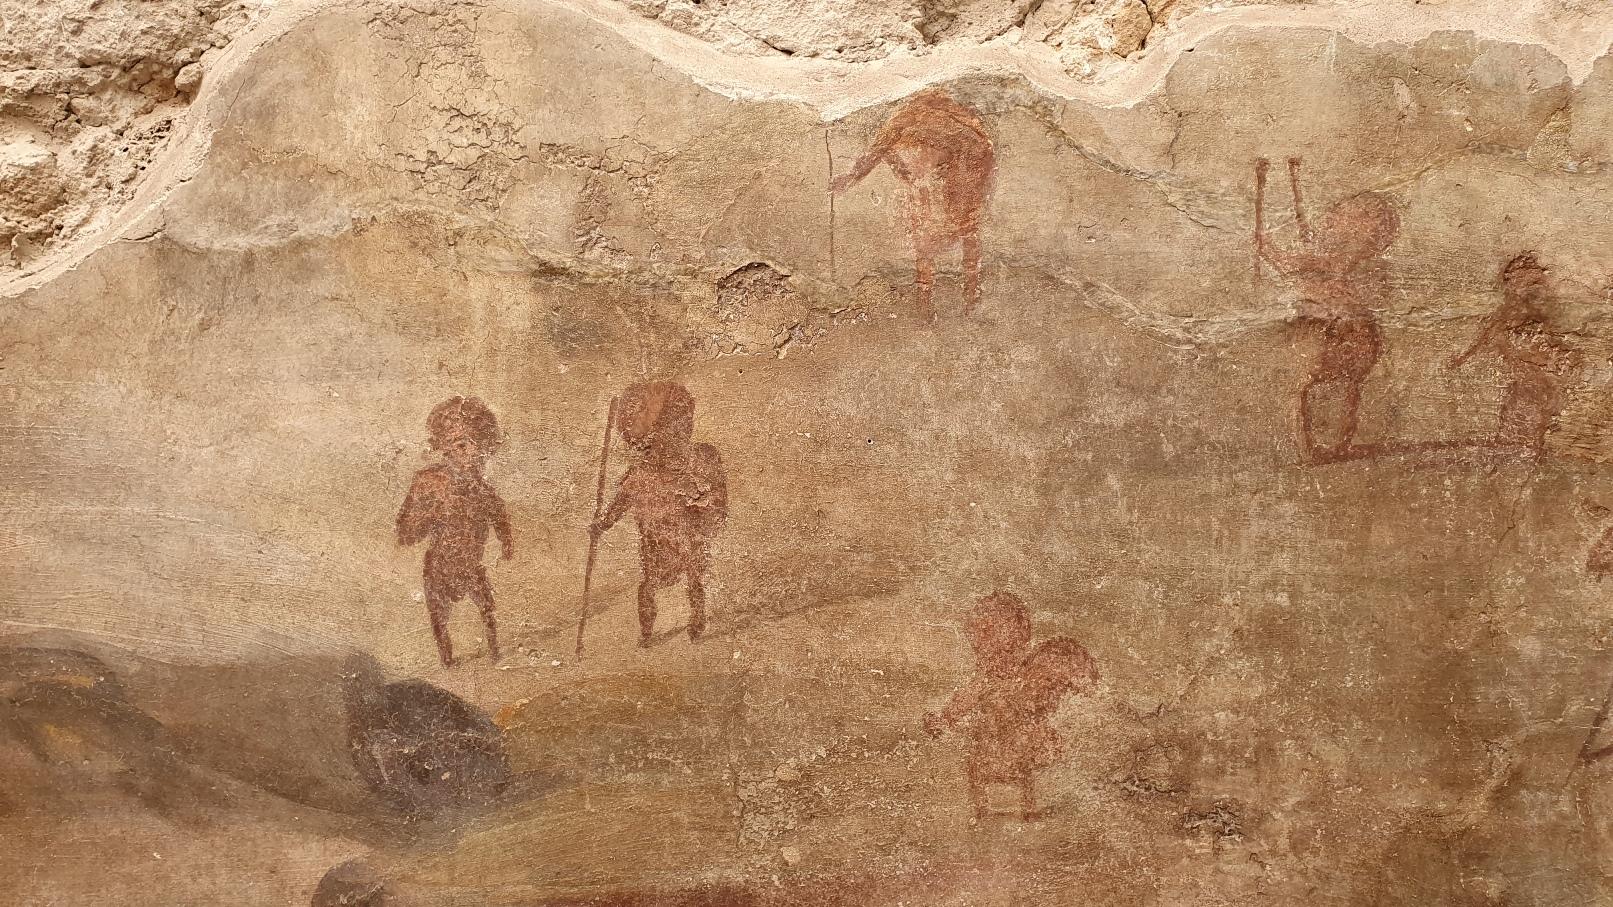 pompei_Casa-dei-Ceii_affresco-giardino_pigmei_foto-parco-archeologico-di-pompei